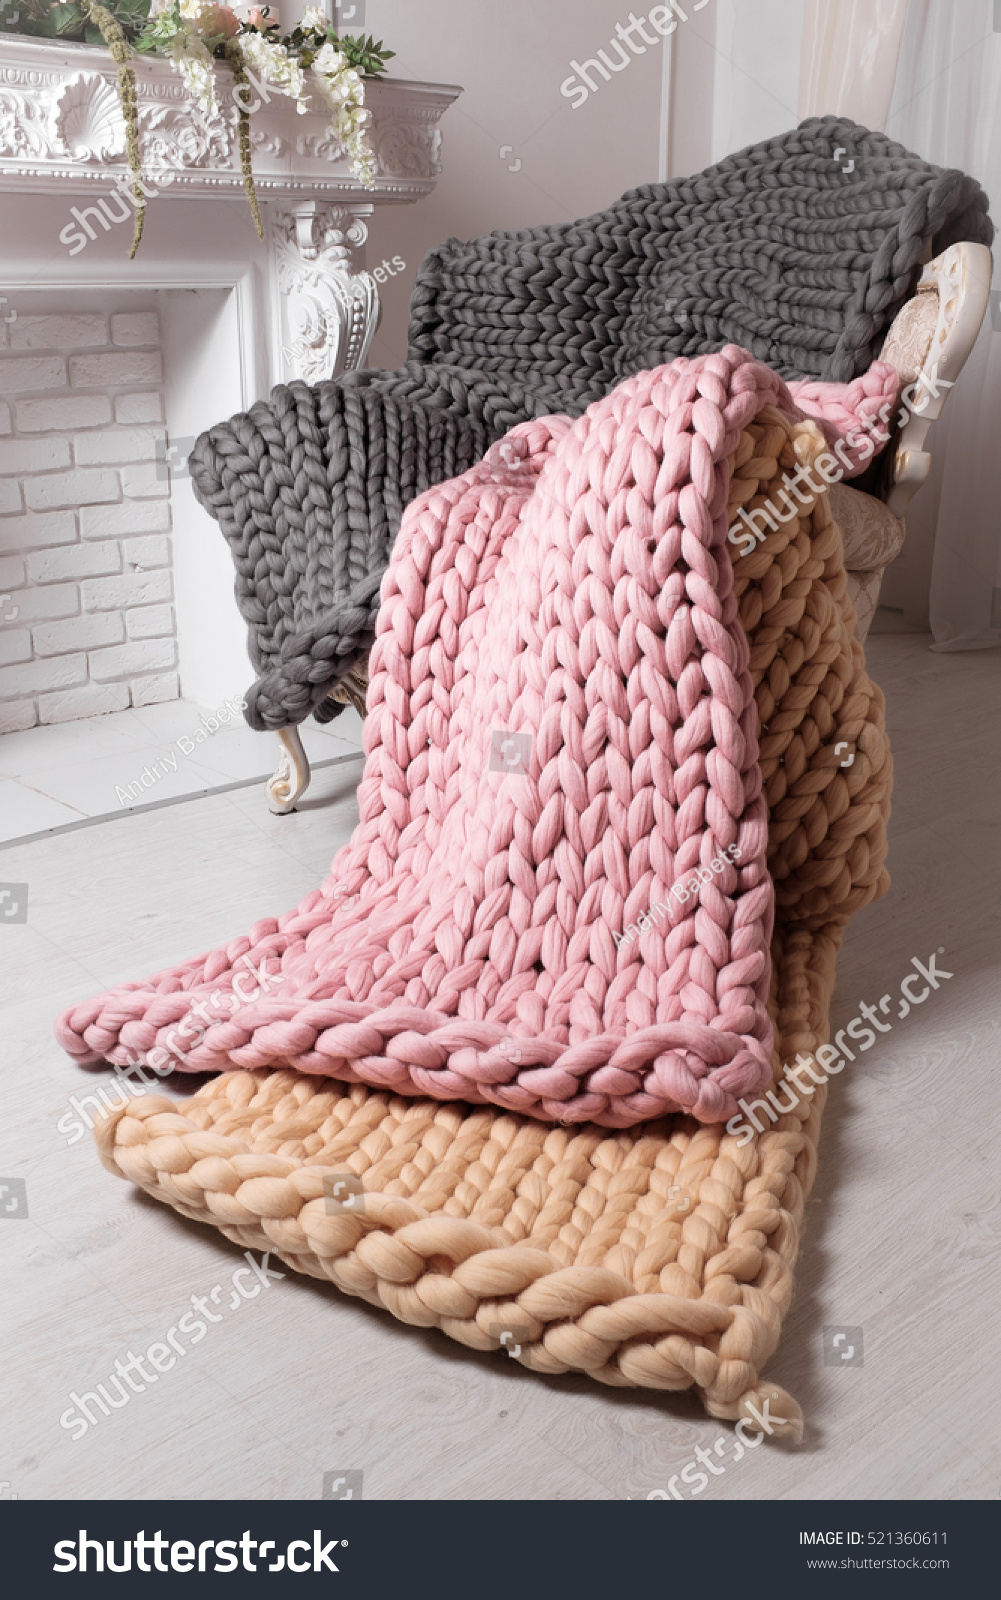 large knit blanket s giant knit stock photo 521360611 shutterstock. Black Bedroom Furniture Sets. Home Design Ideas